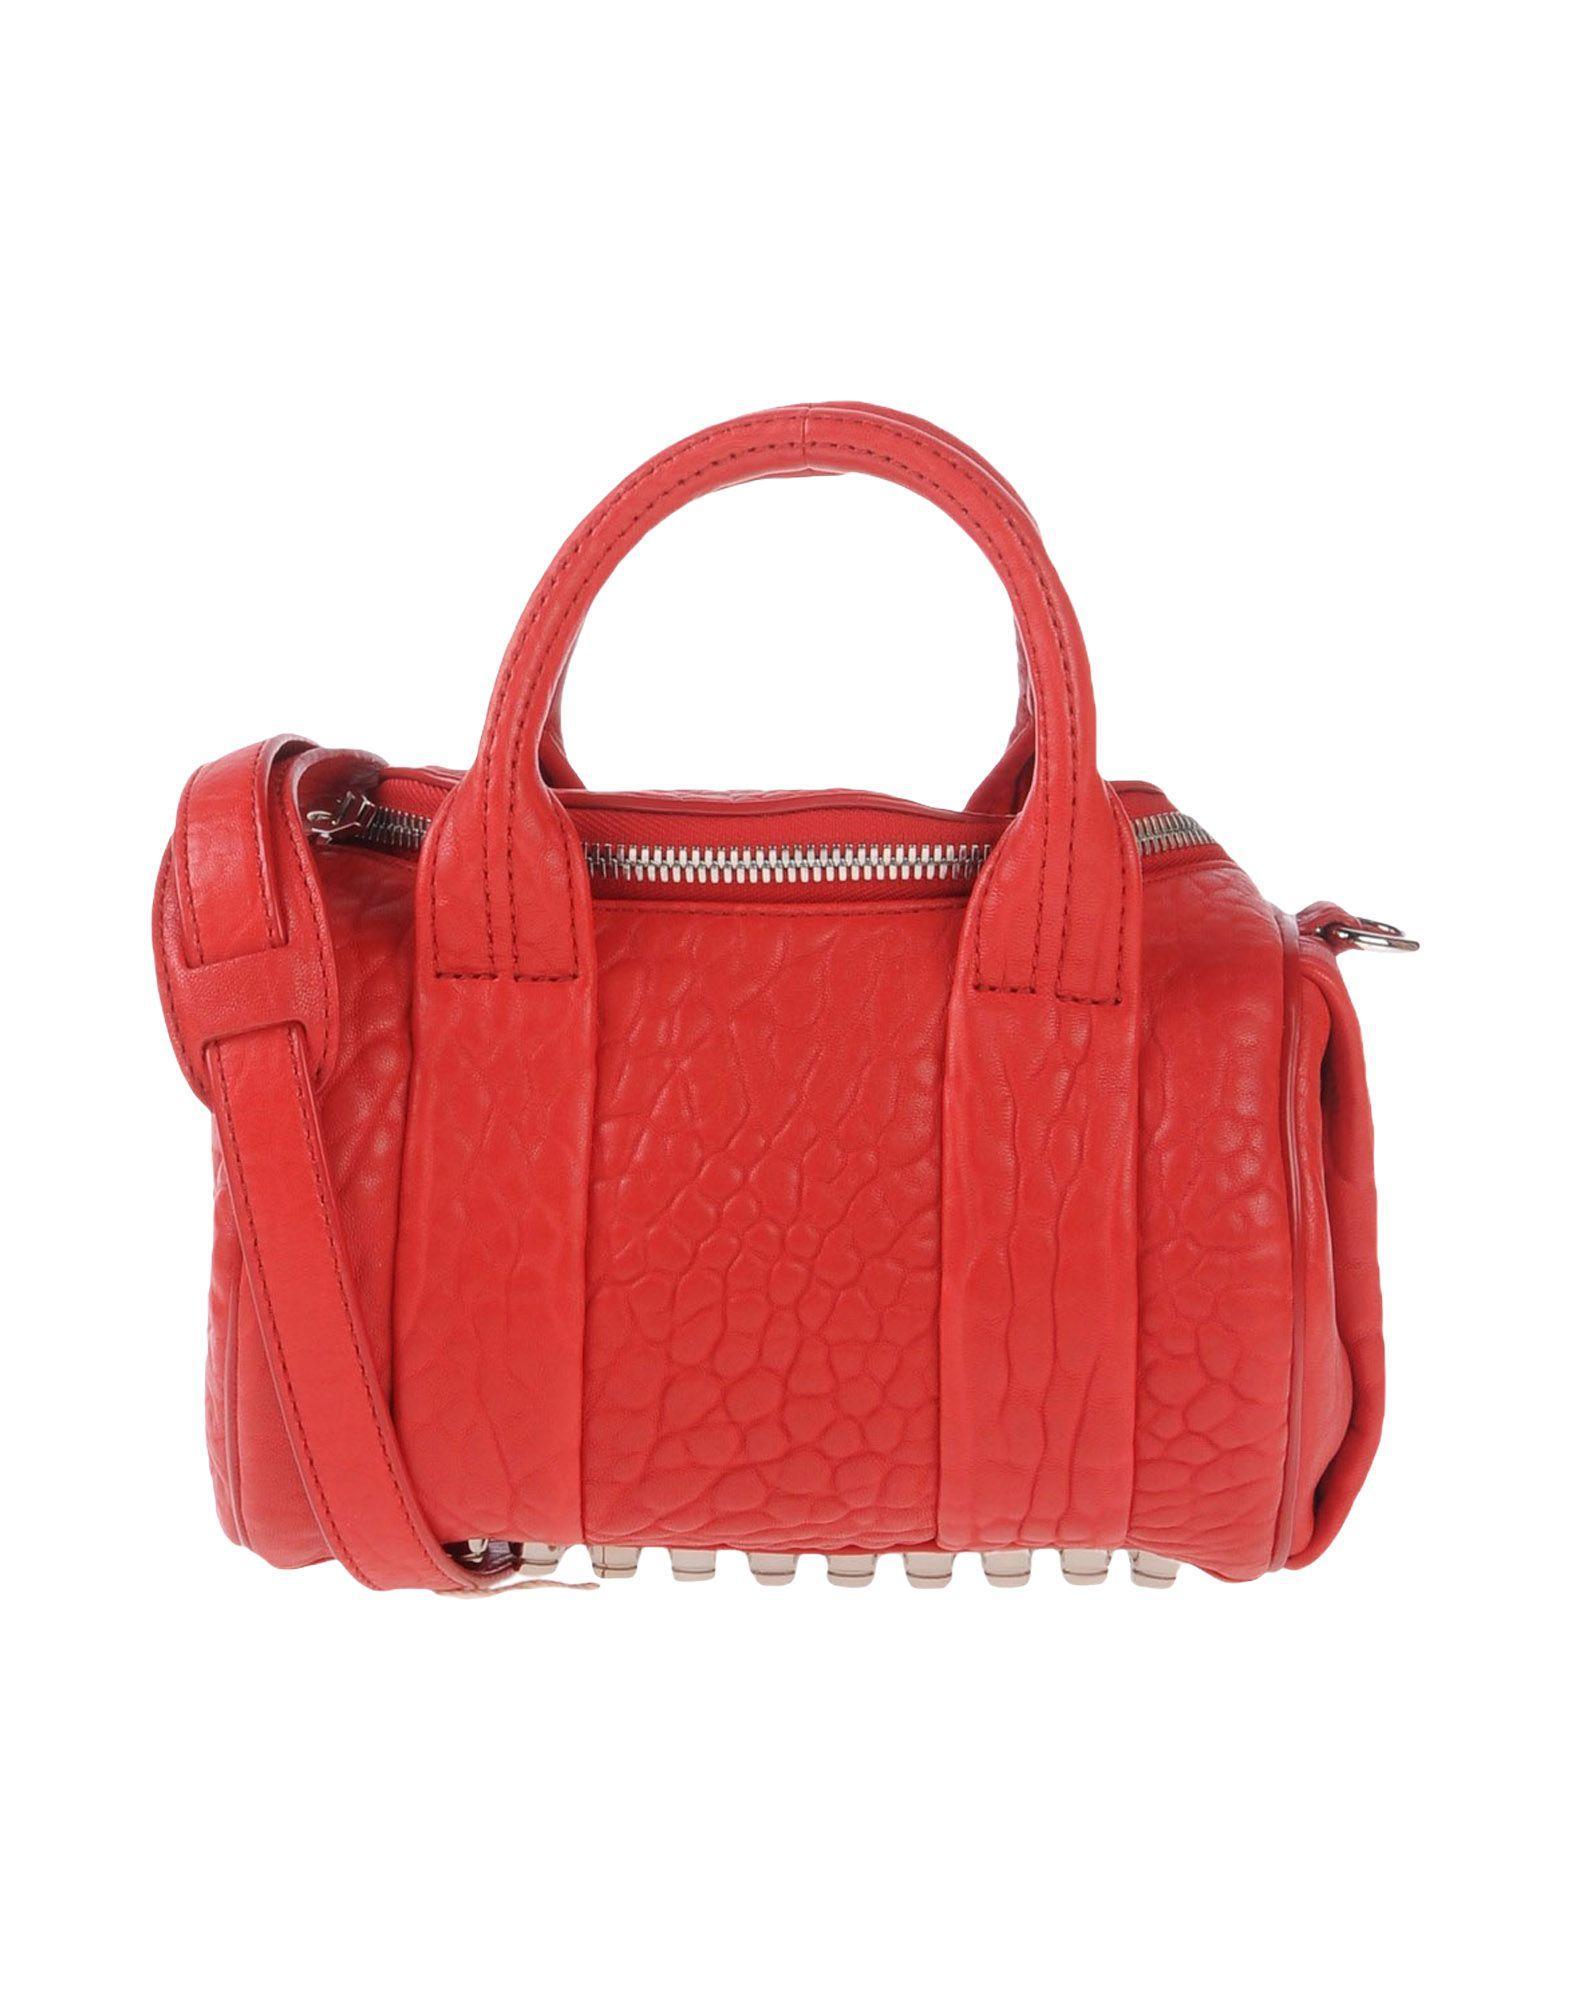 Alexander Wang Handbags In Red